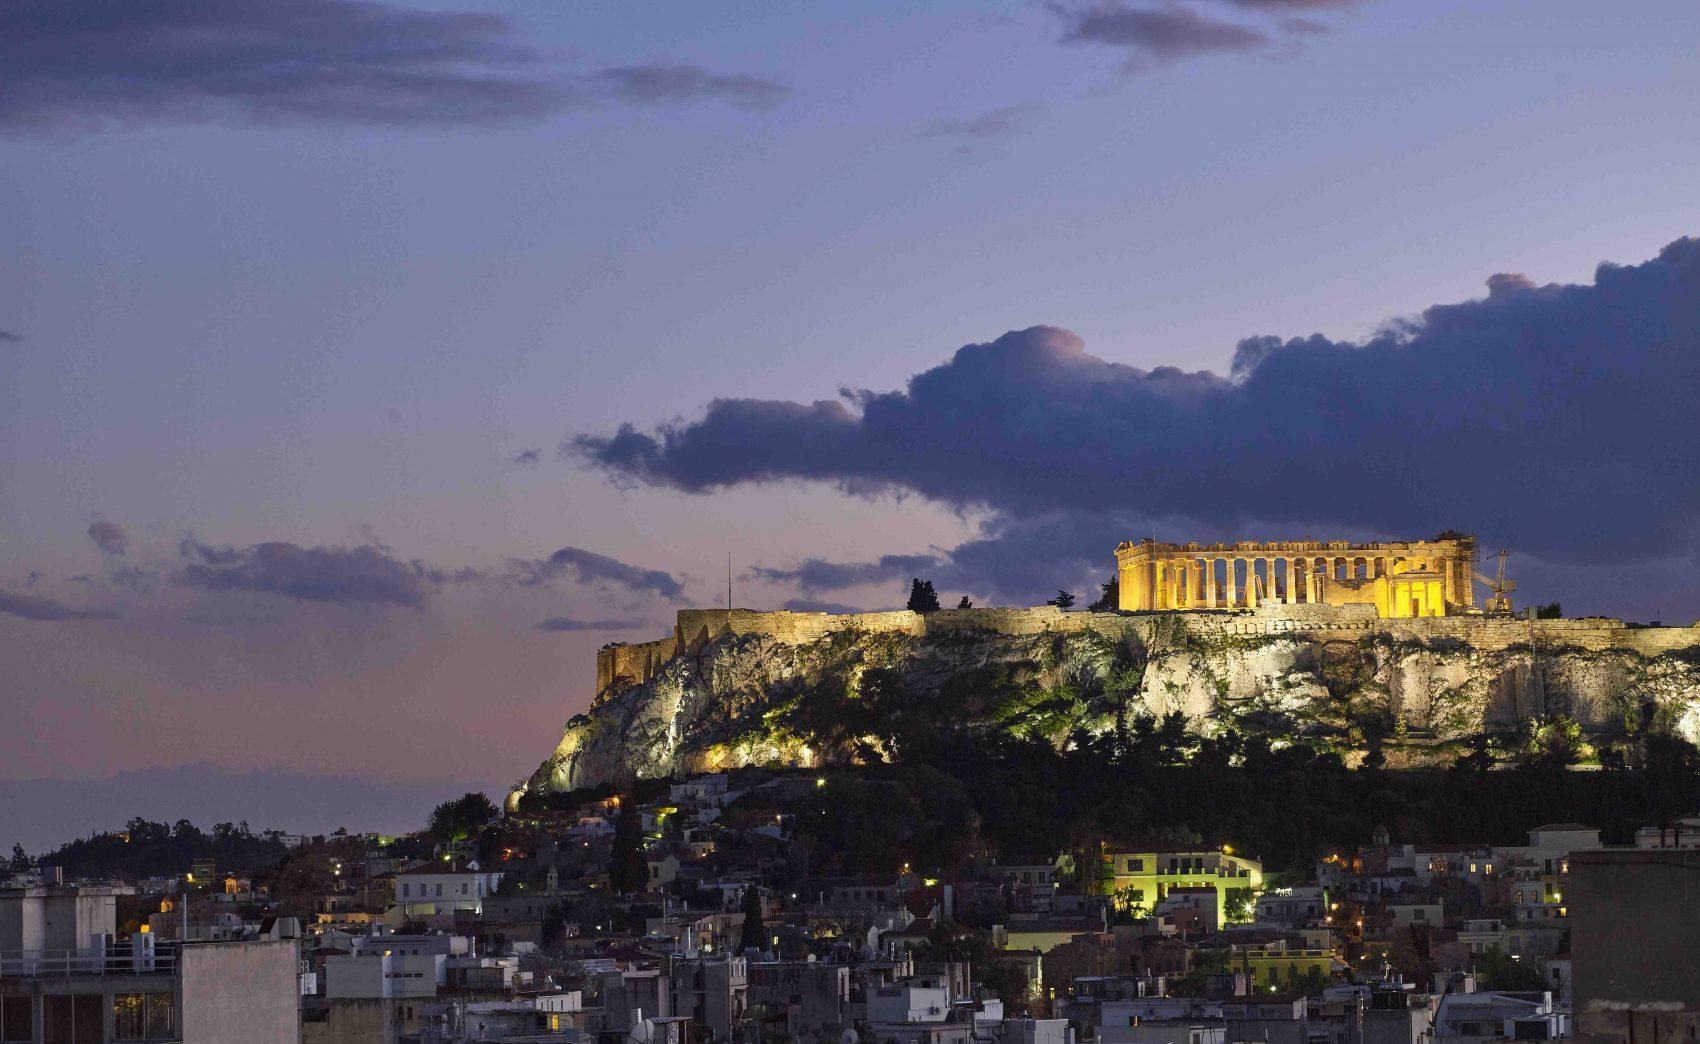 GREECE'S ACROPOLIS